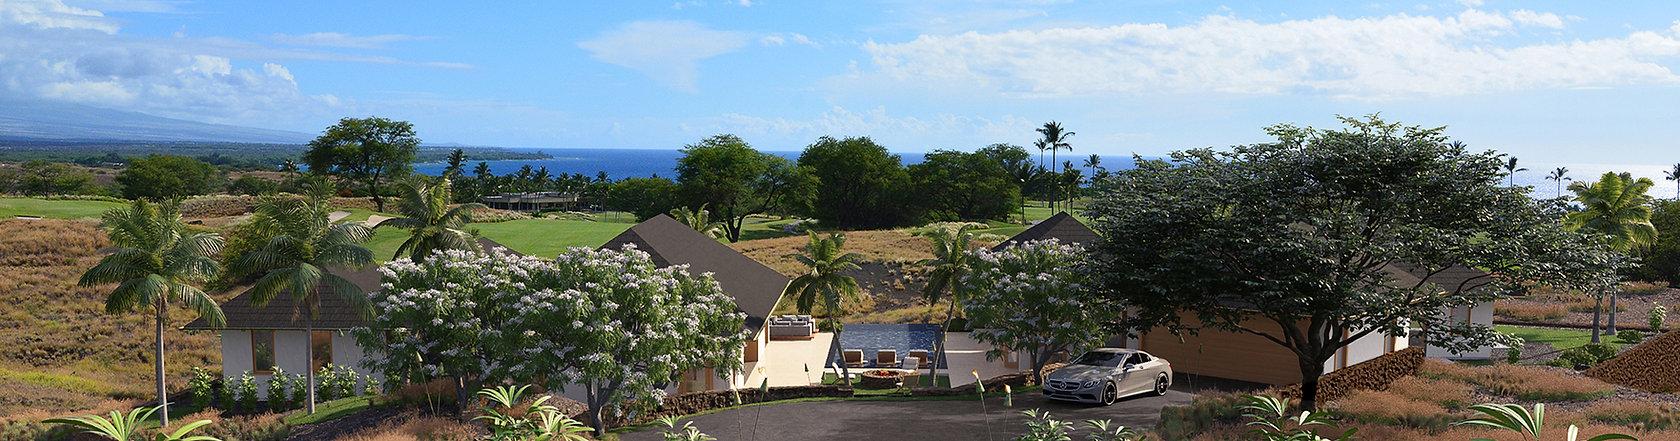 VillageHouse-MaunaKea_Ex6.jpg